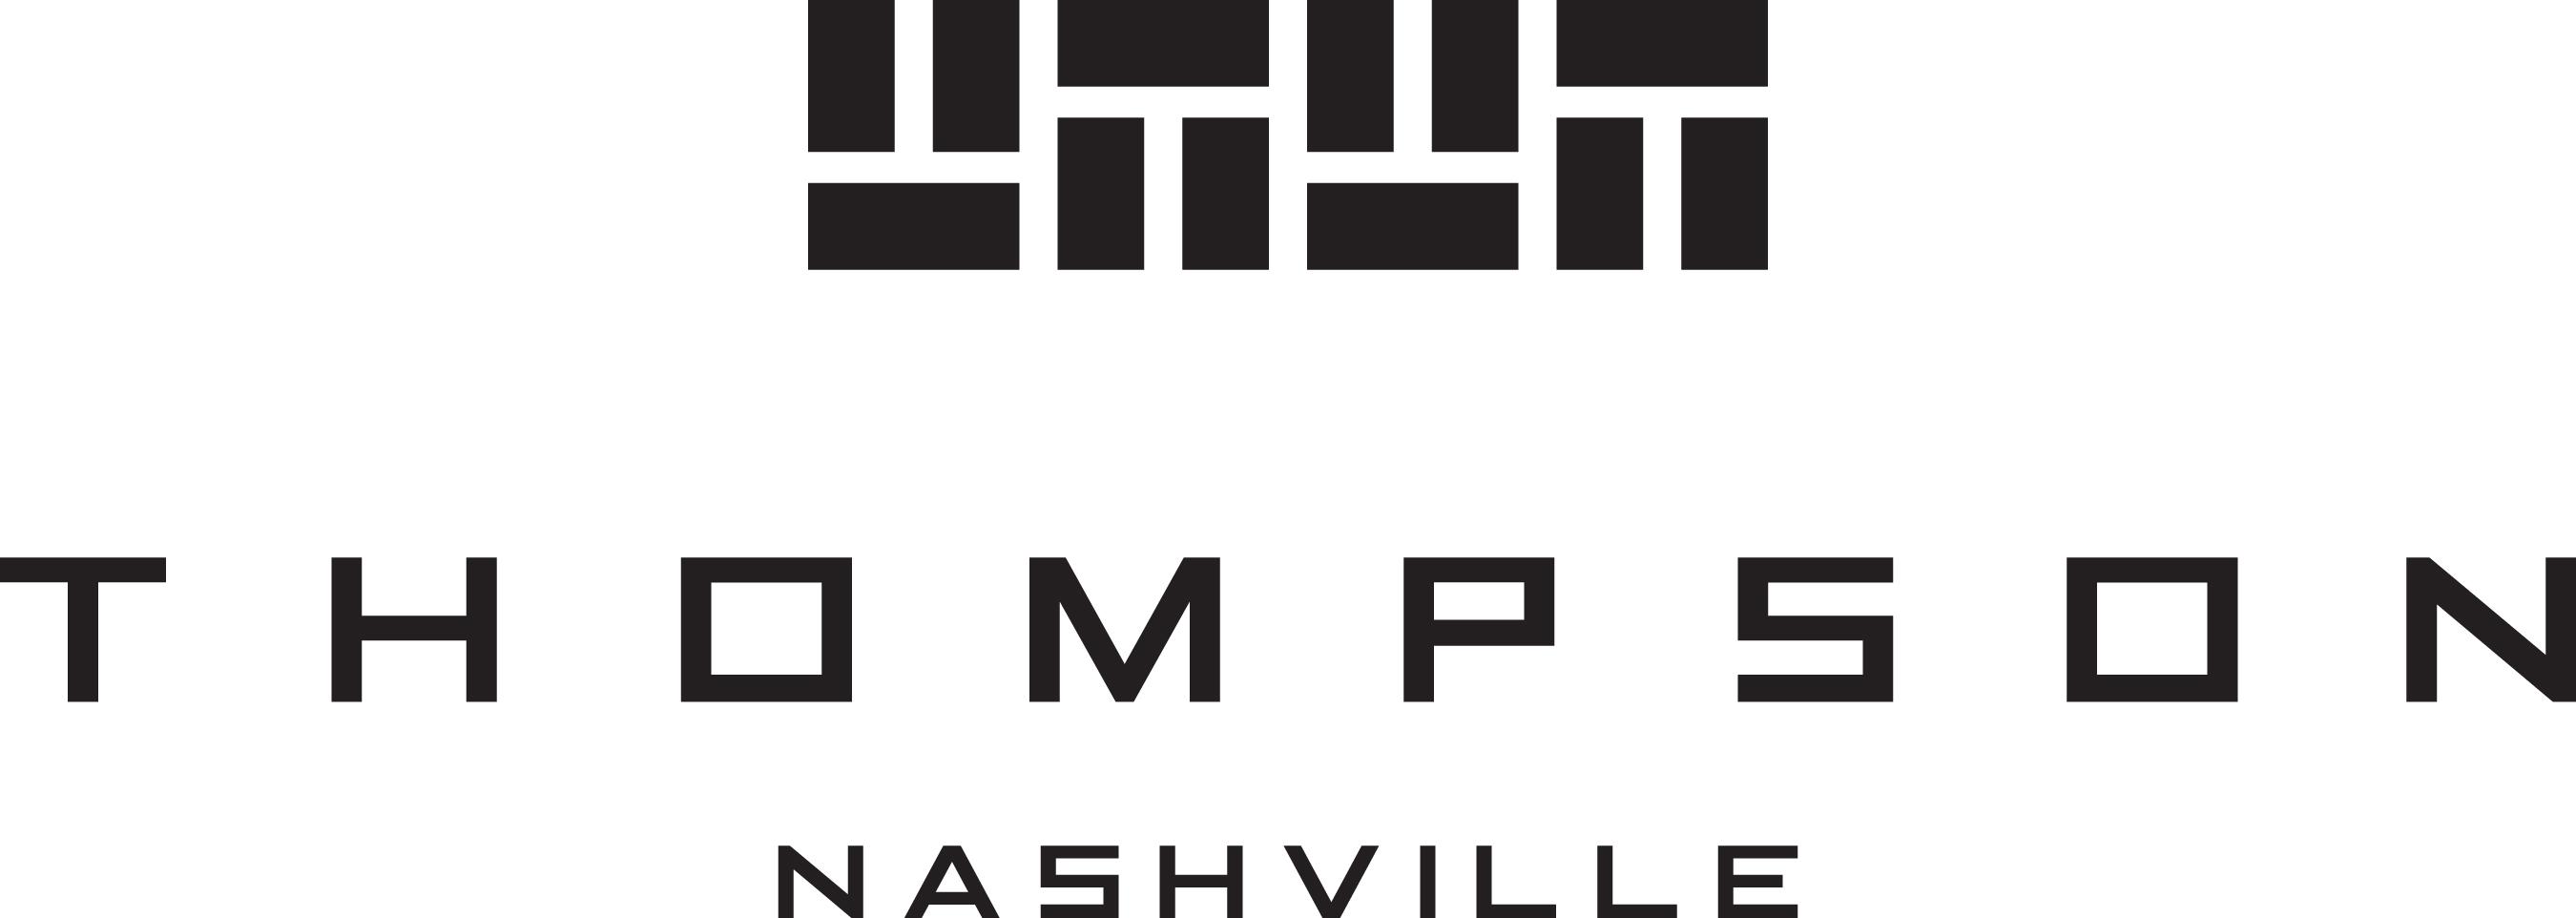 TH_Nashville_Logo